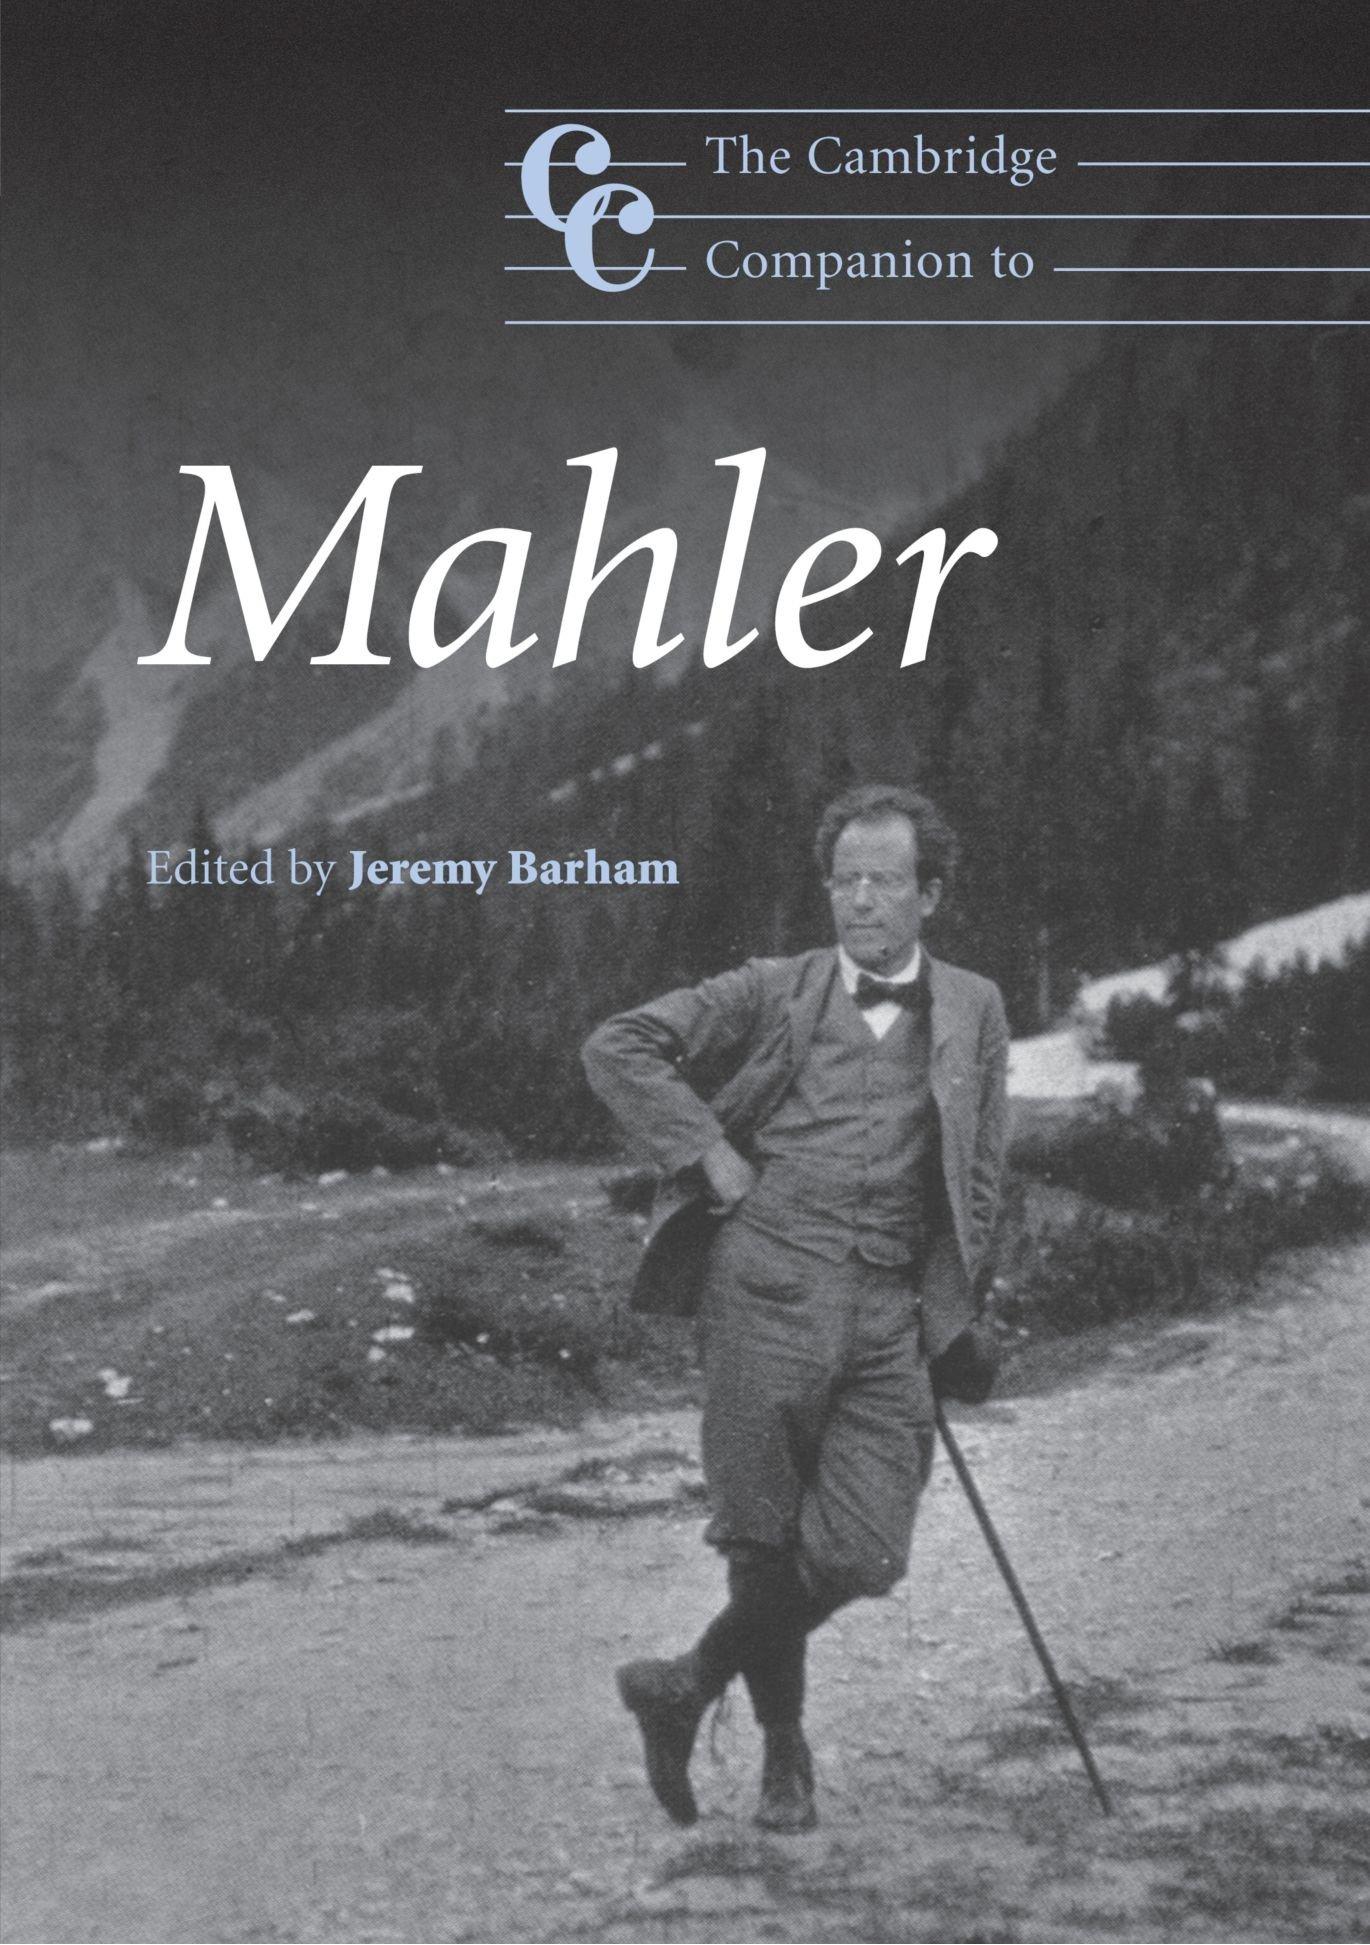 The Cambridge Companion to Mahler (Cambridge Companions to Music): Jeremy  Barham: 9780521540339: Amazon.com: Books